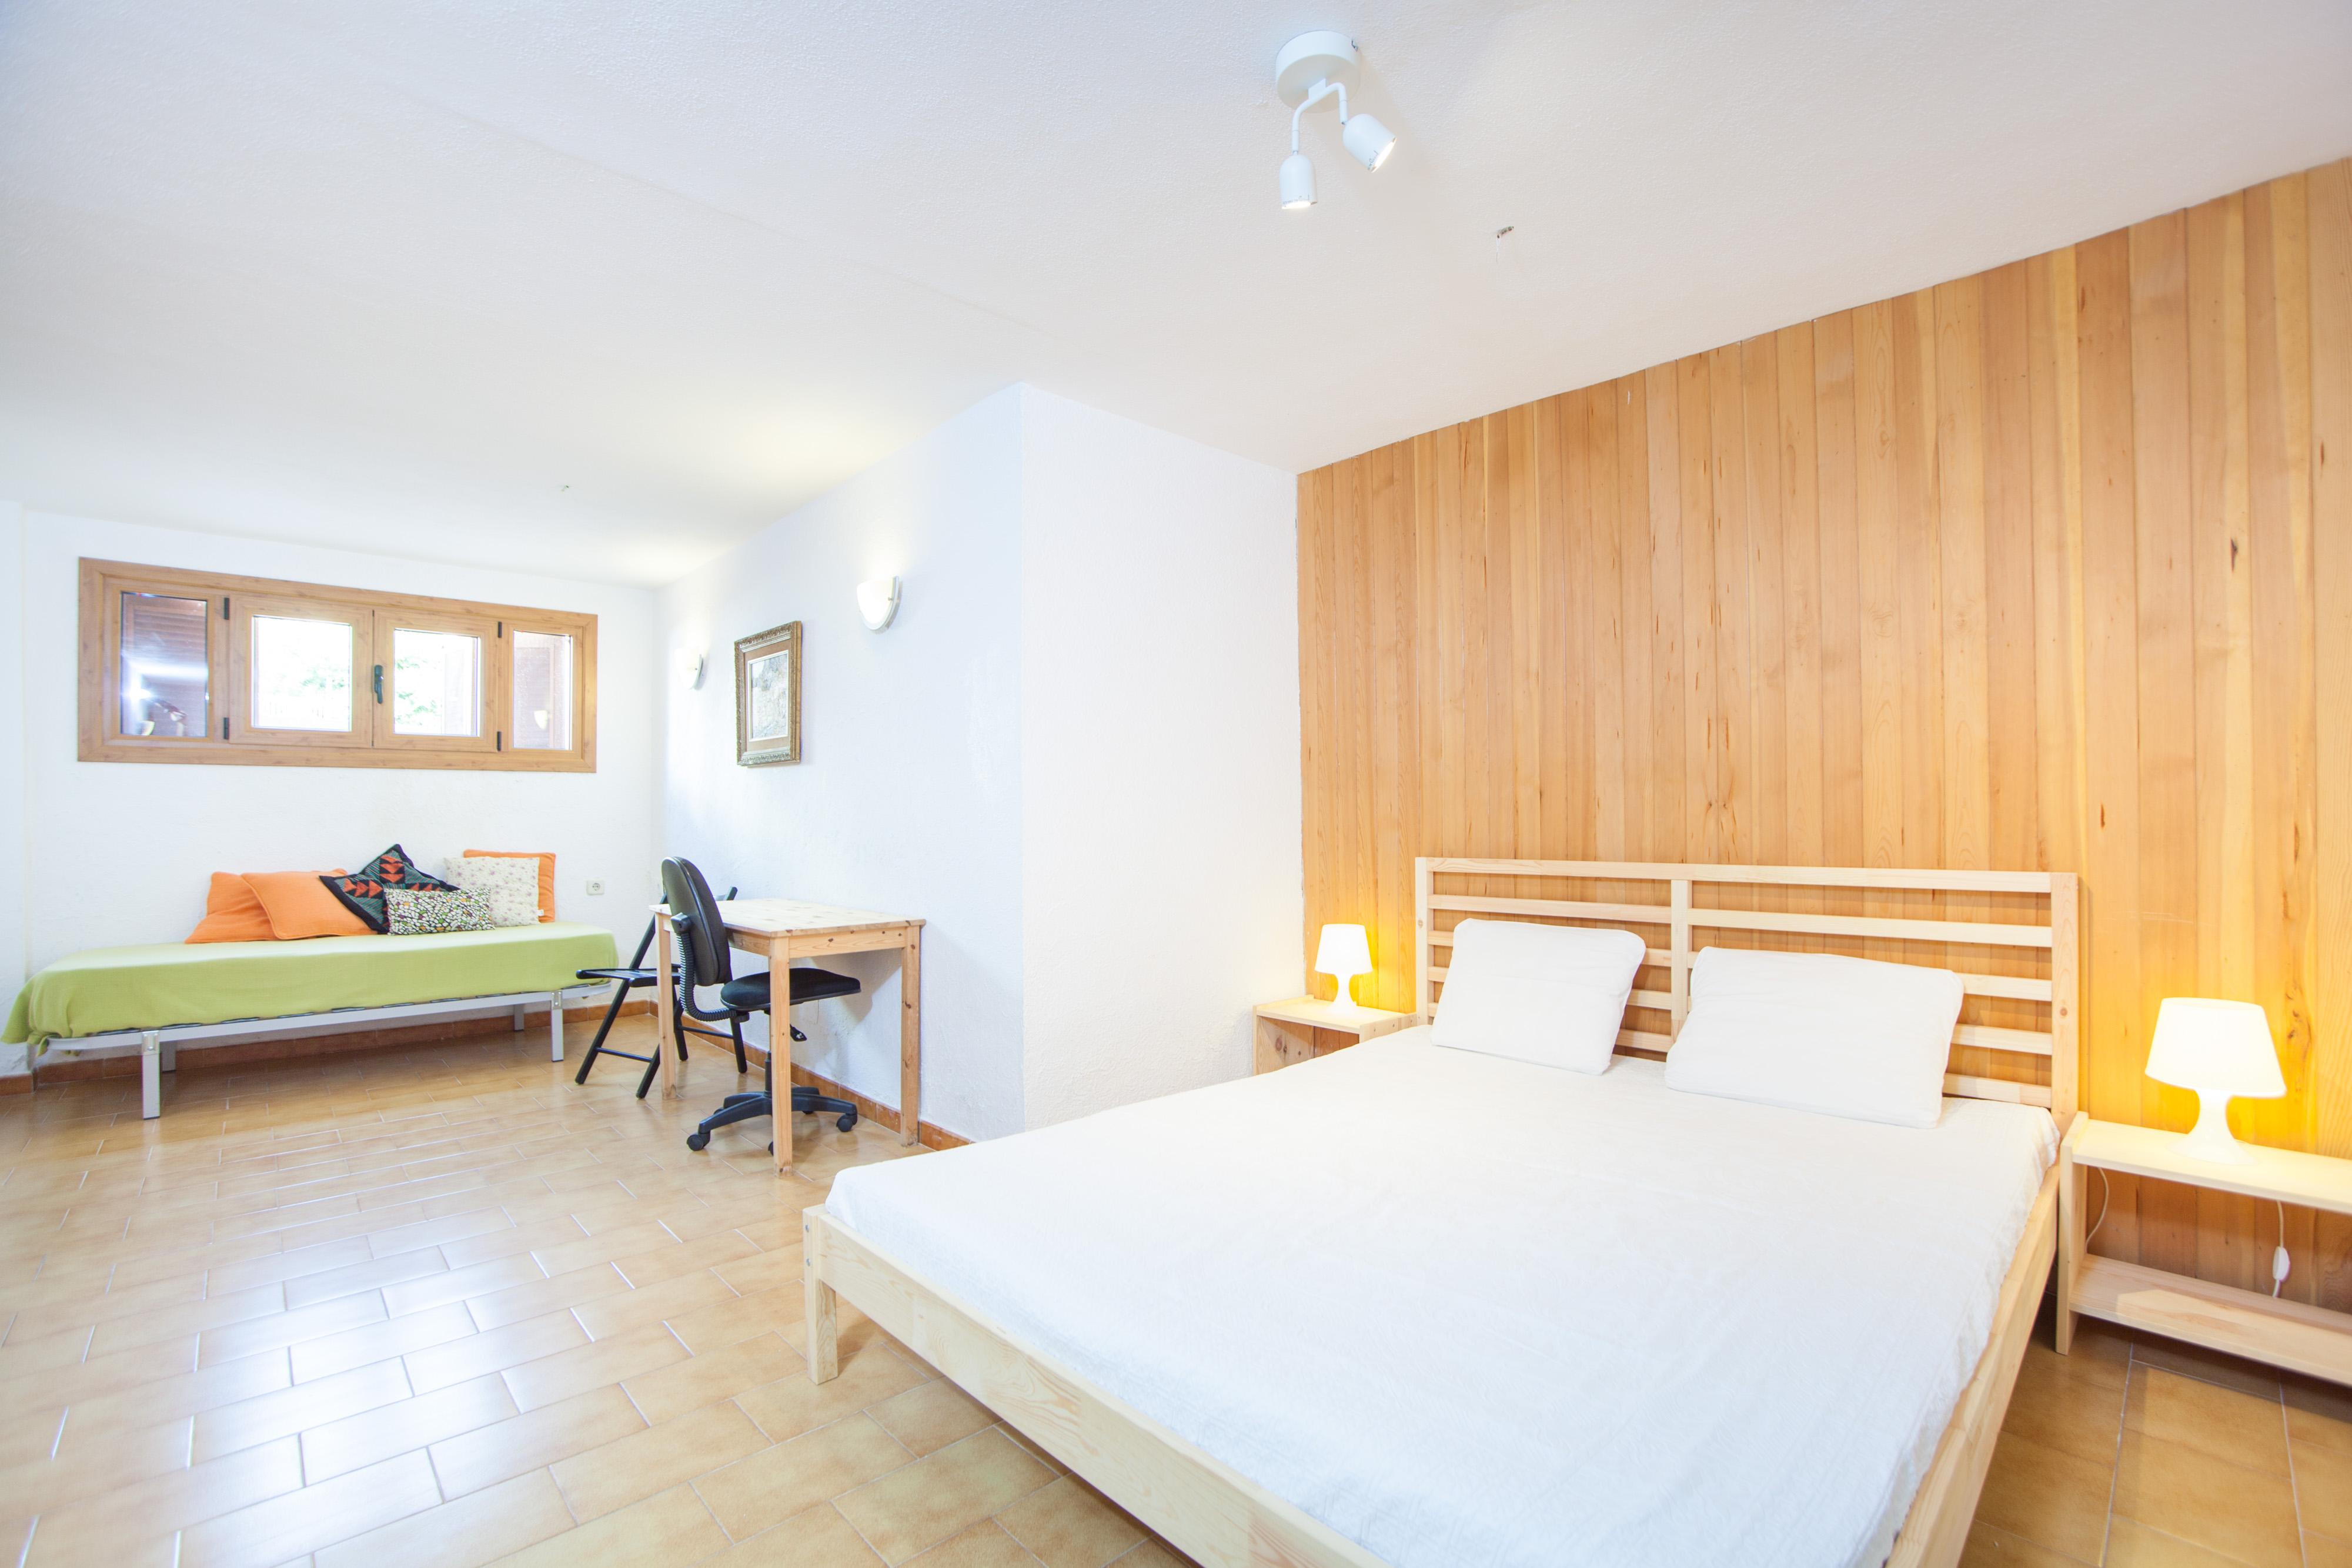 Ferienhaus CAN CUSSÓ SANSÓ (2198042), Colonia de Sant Pere, Mallorca, Balearische Inseln, Spanien, Bild 20